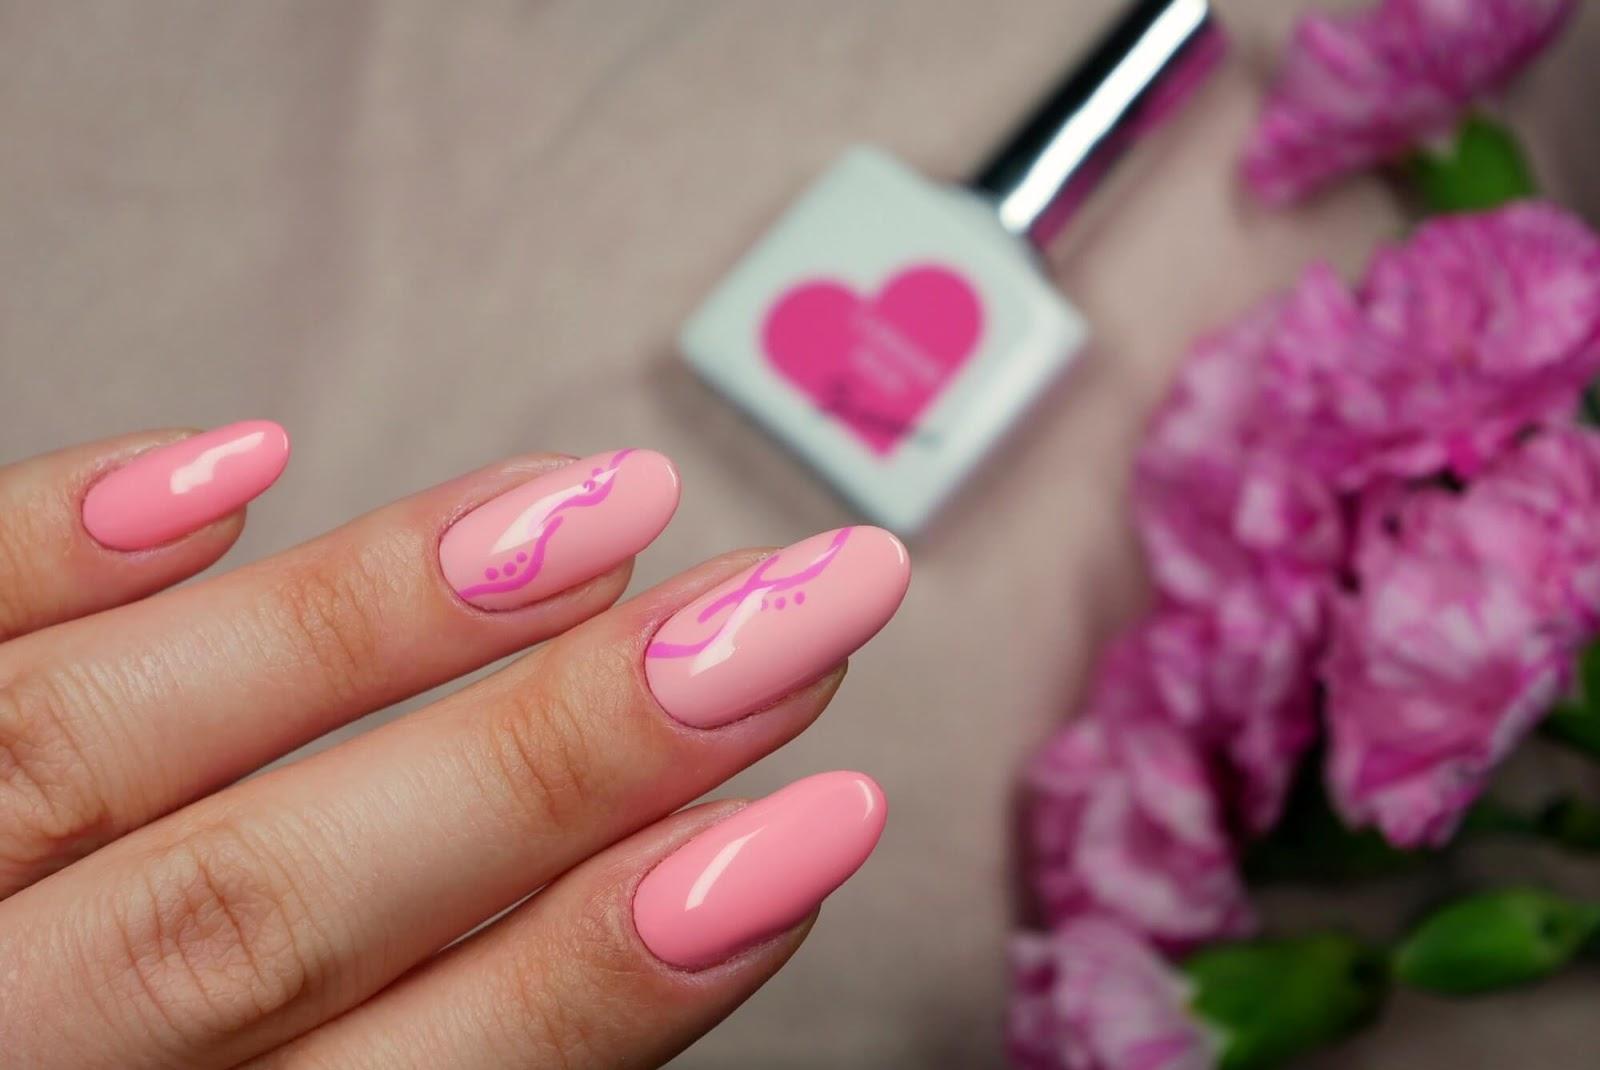 paznokcie hybrydowe - róż